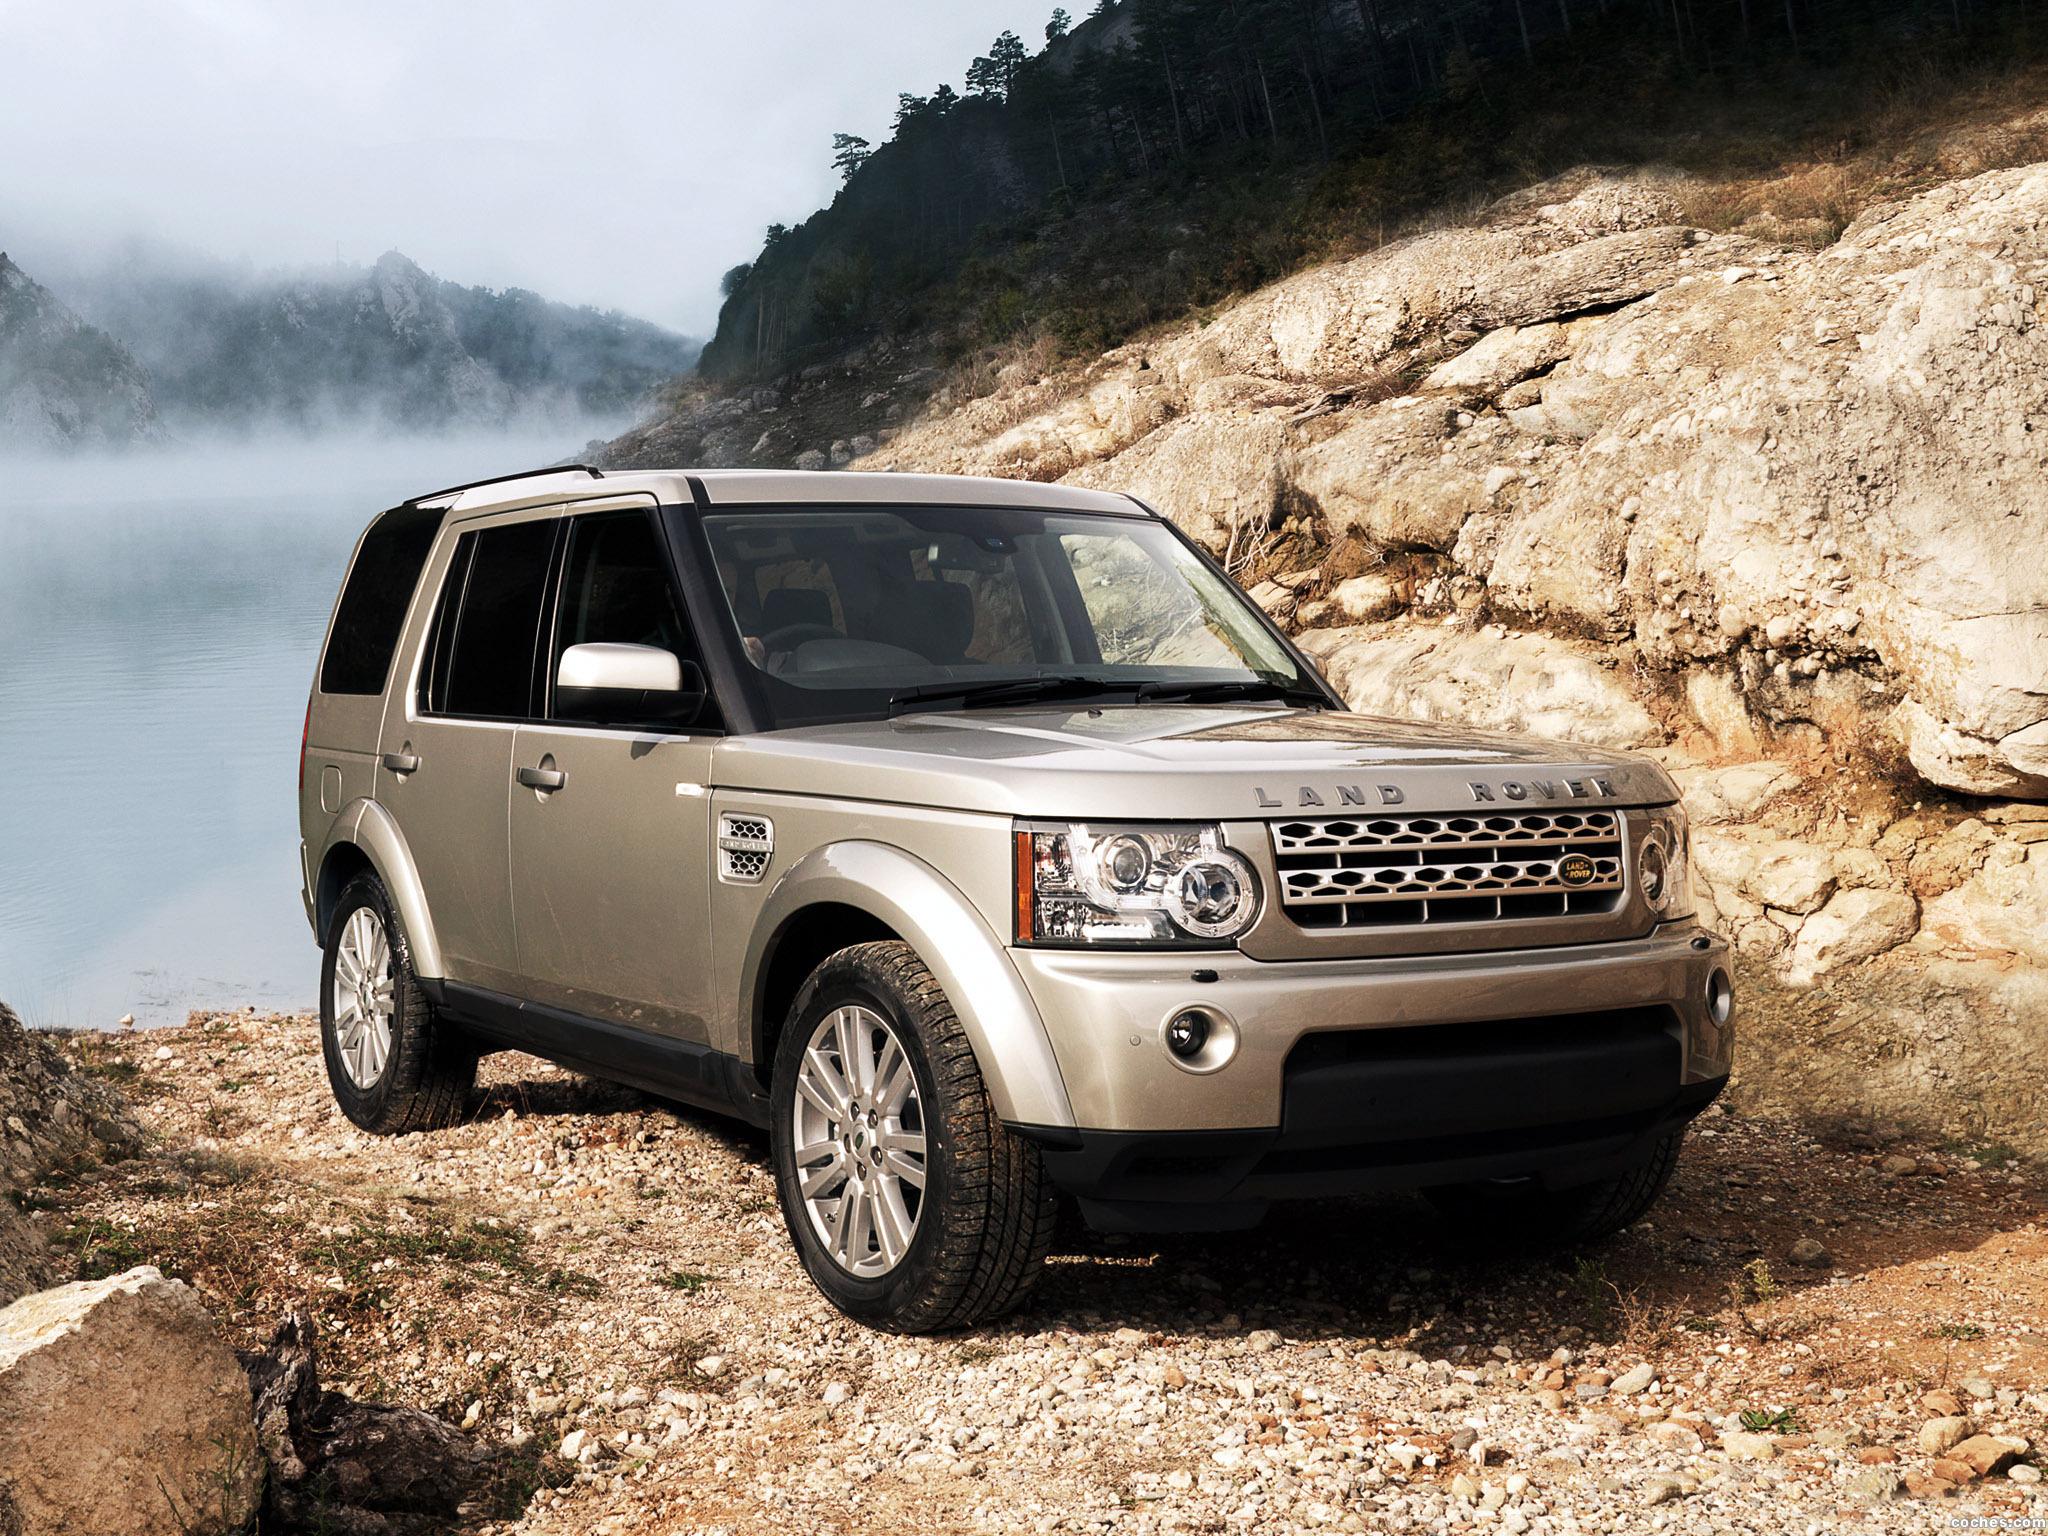 Foto 0 de Land Rover Discovery 4 3.0 TDV6 2009